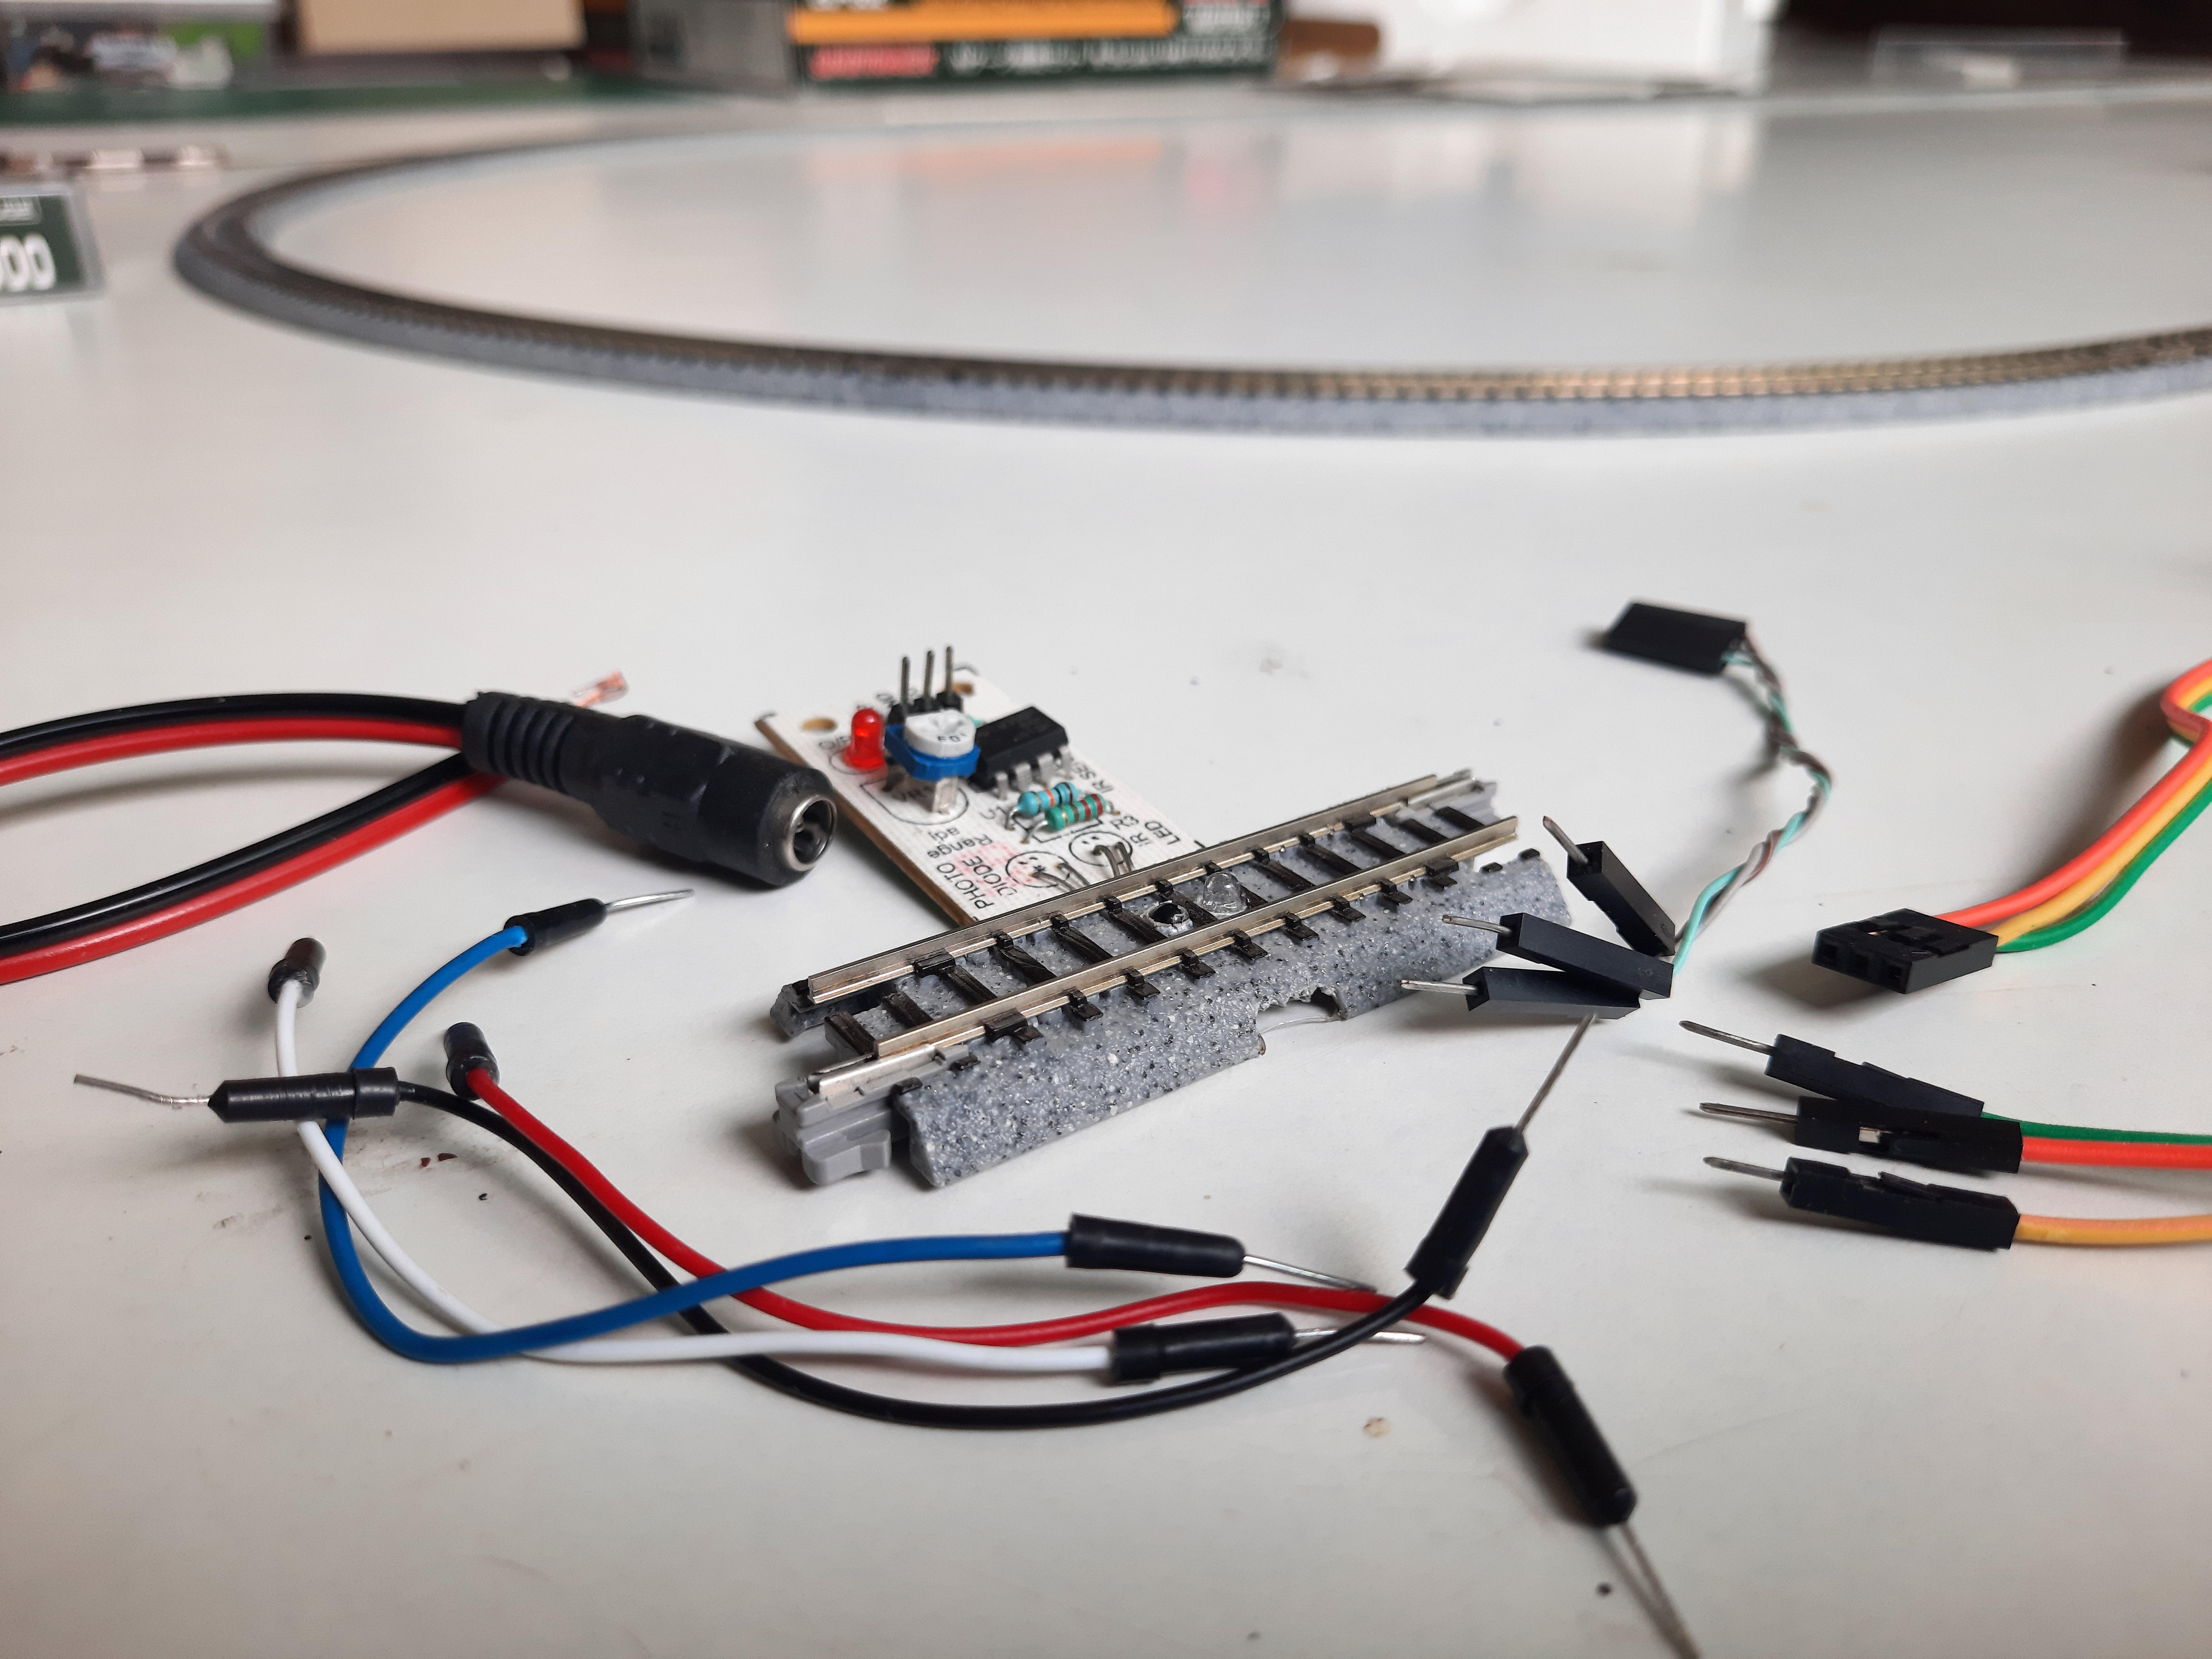 sensored parts of train track